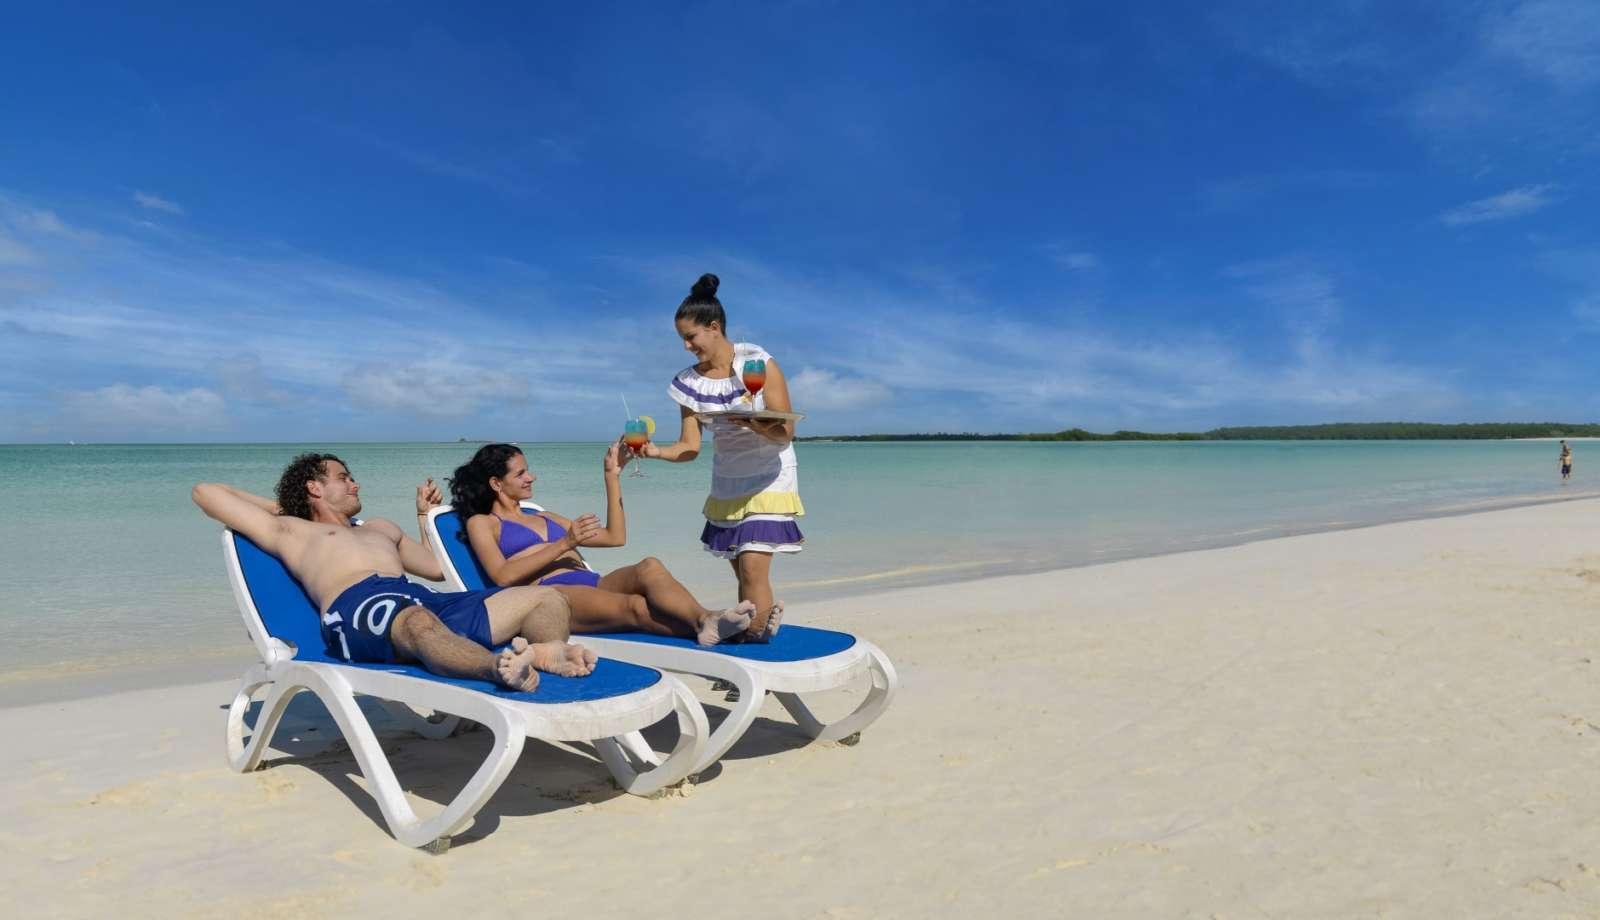 Beach service at Iberostar Ensenachos